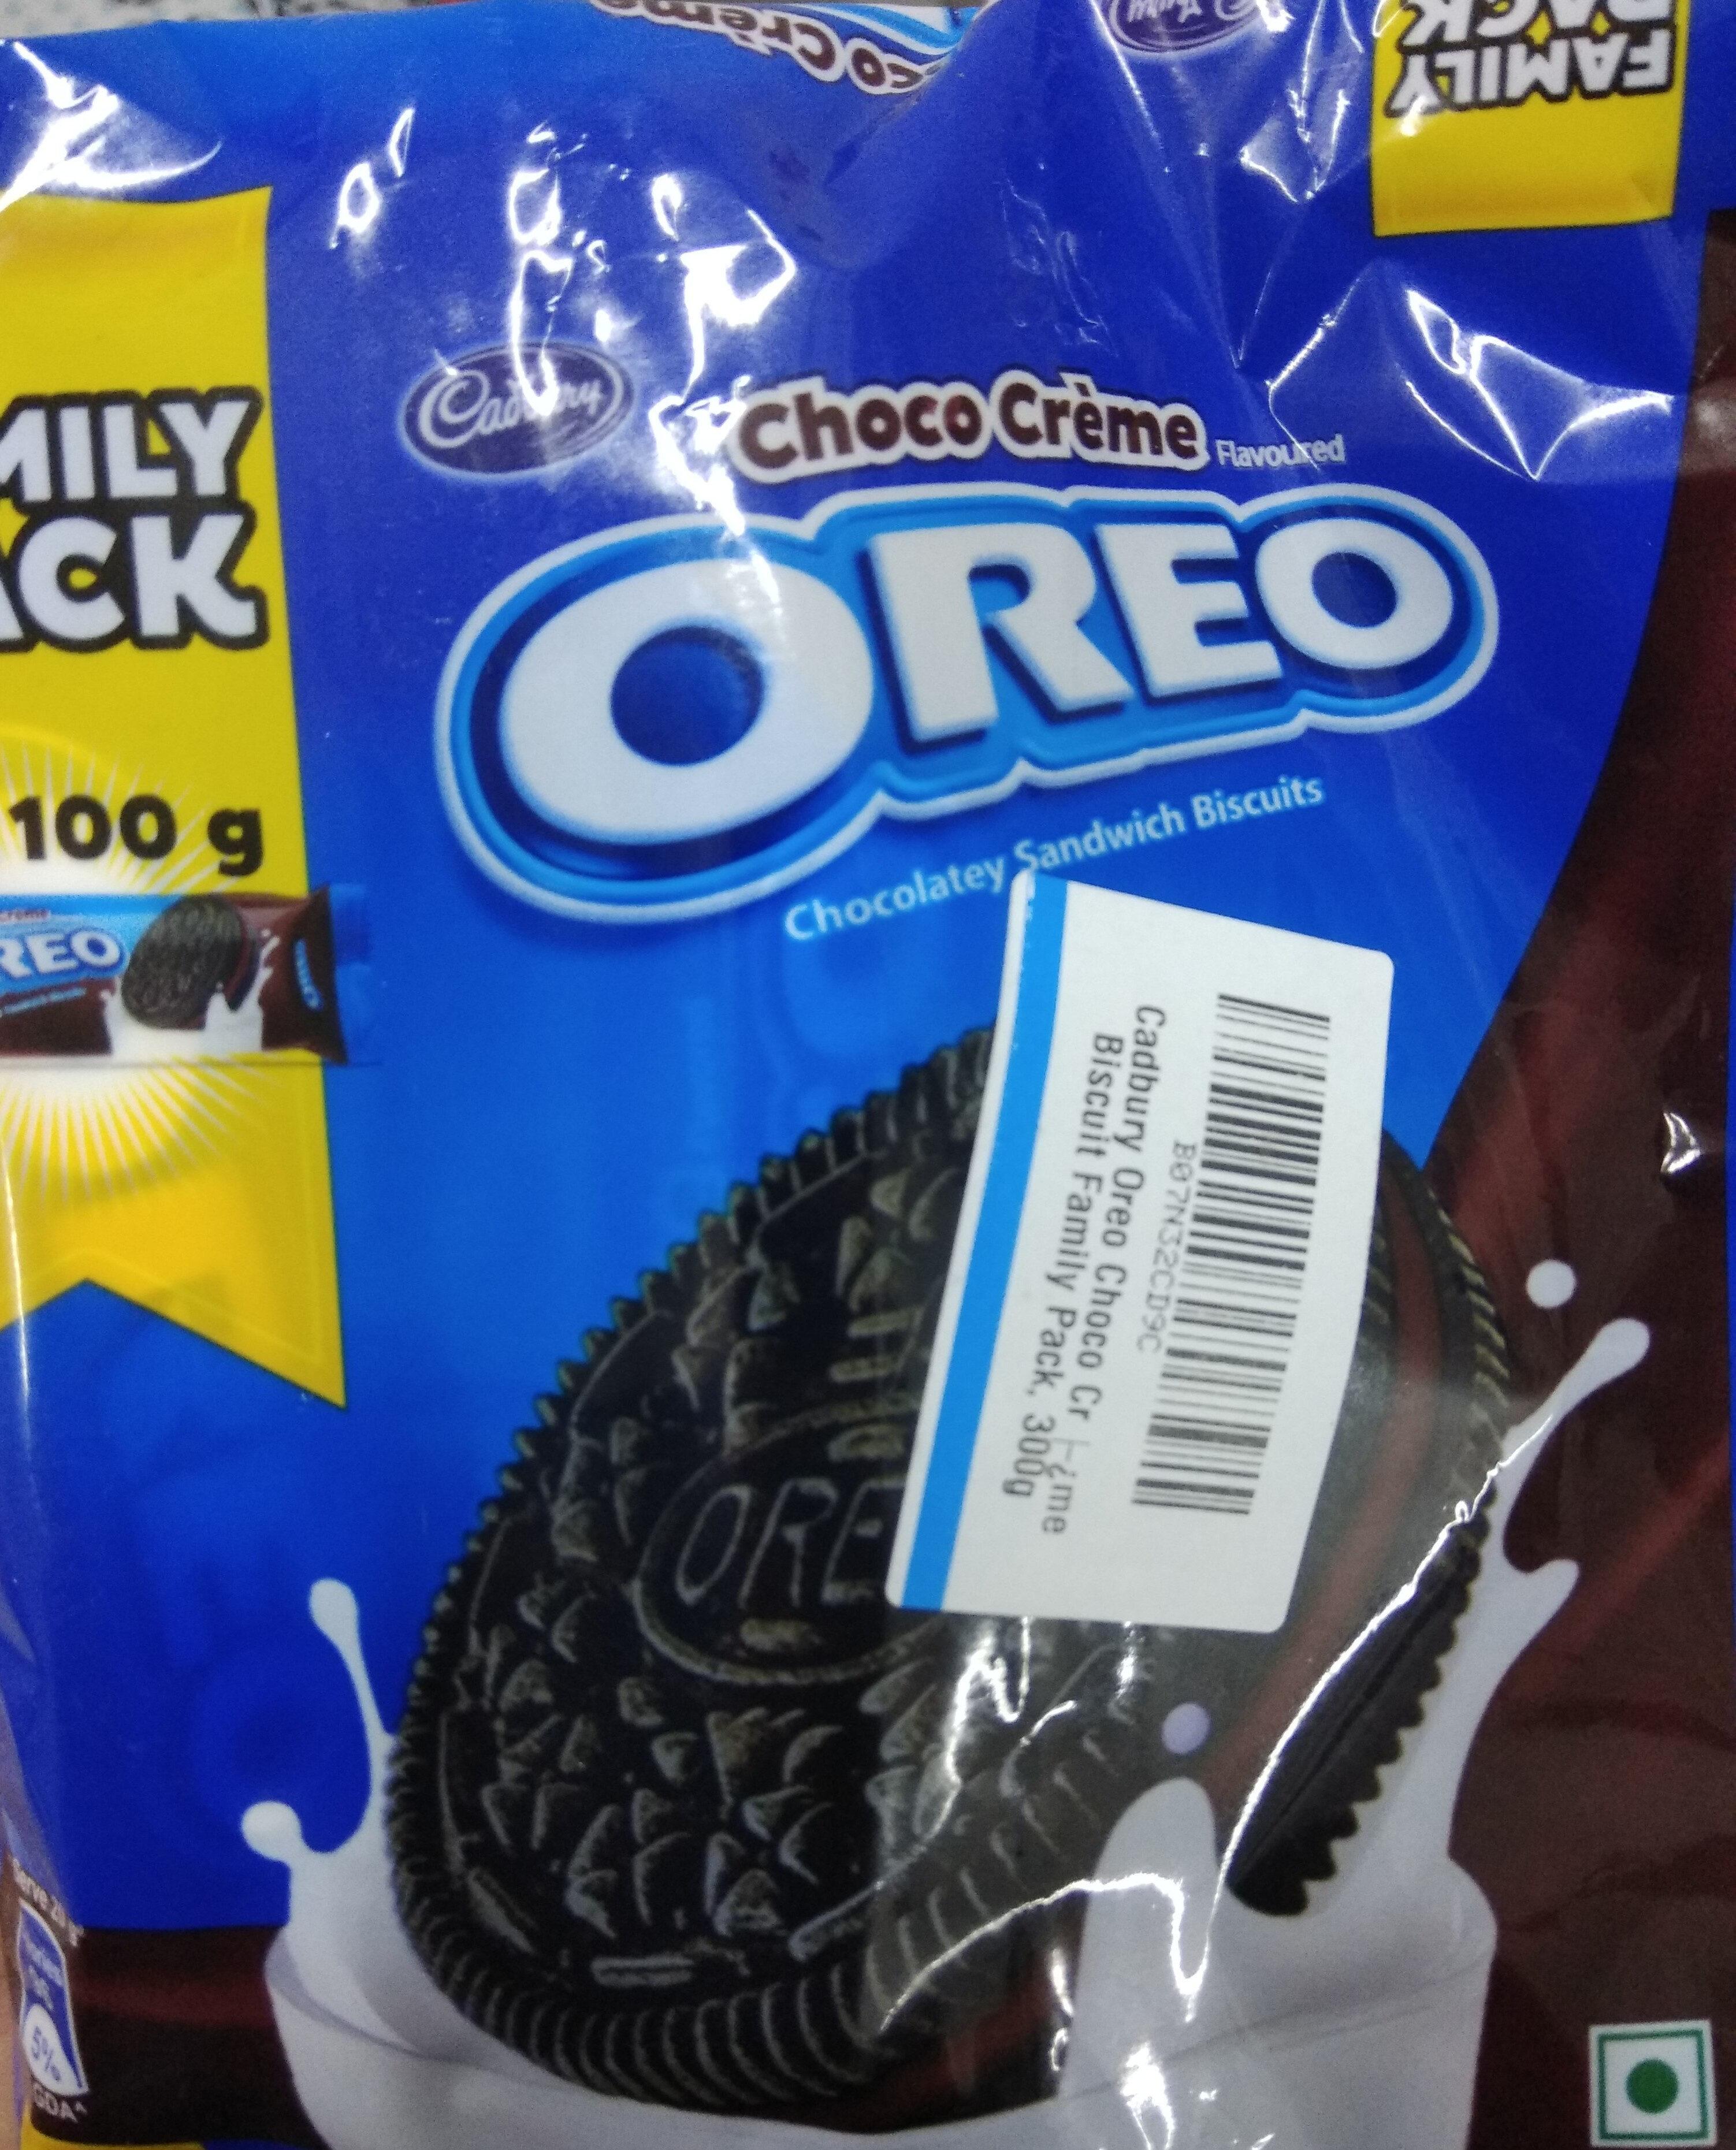 Cadbury Choco Creme Oreo - Product - en